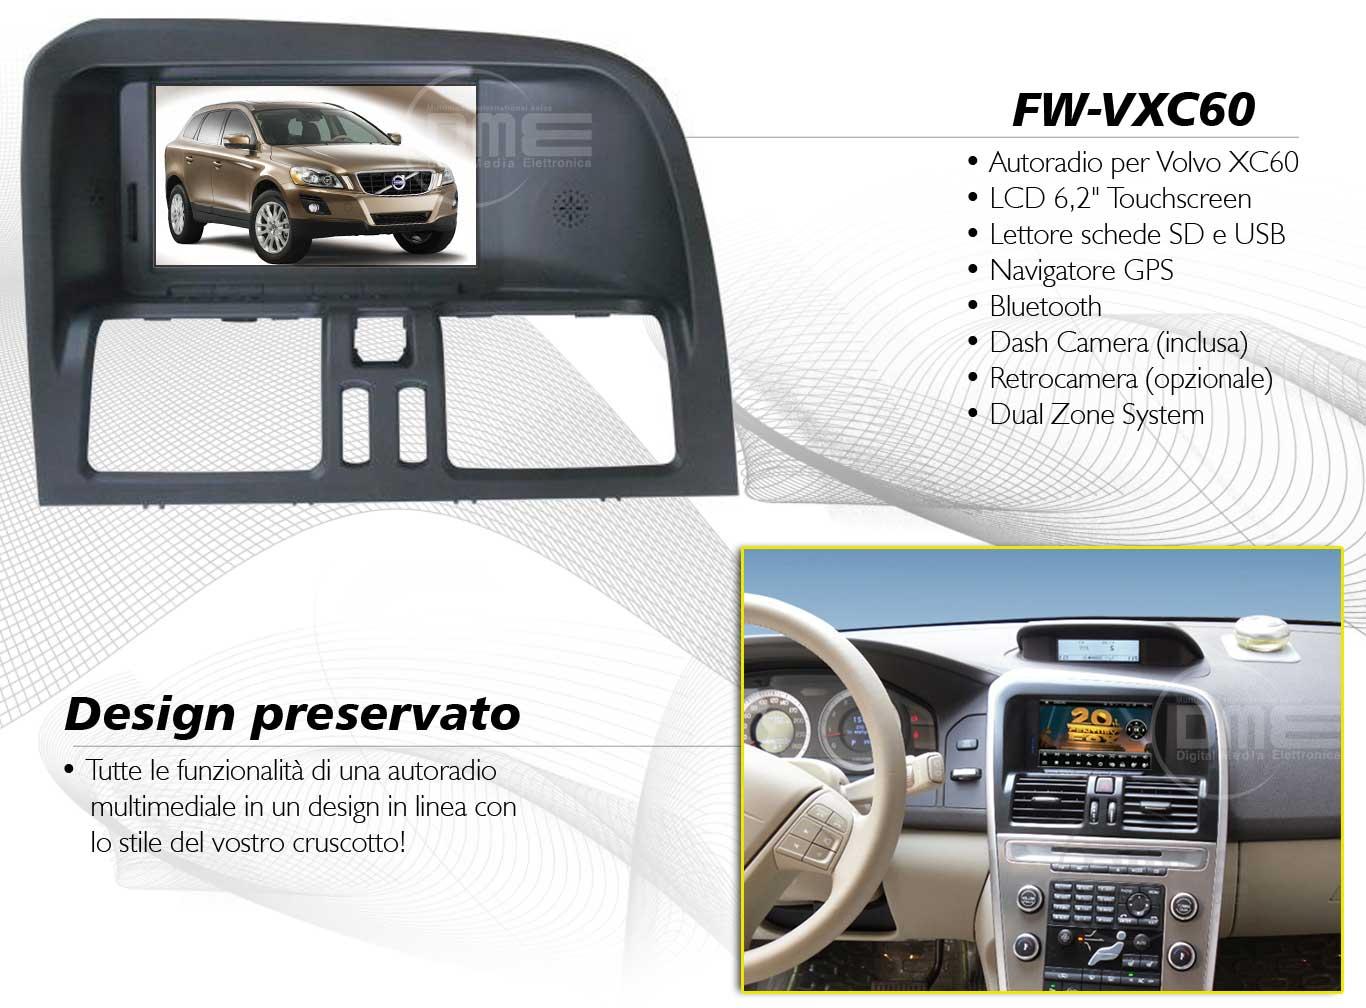 autoradio multimediale per Volvo XC60